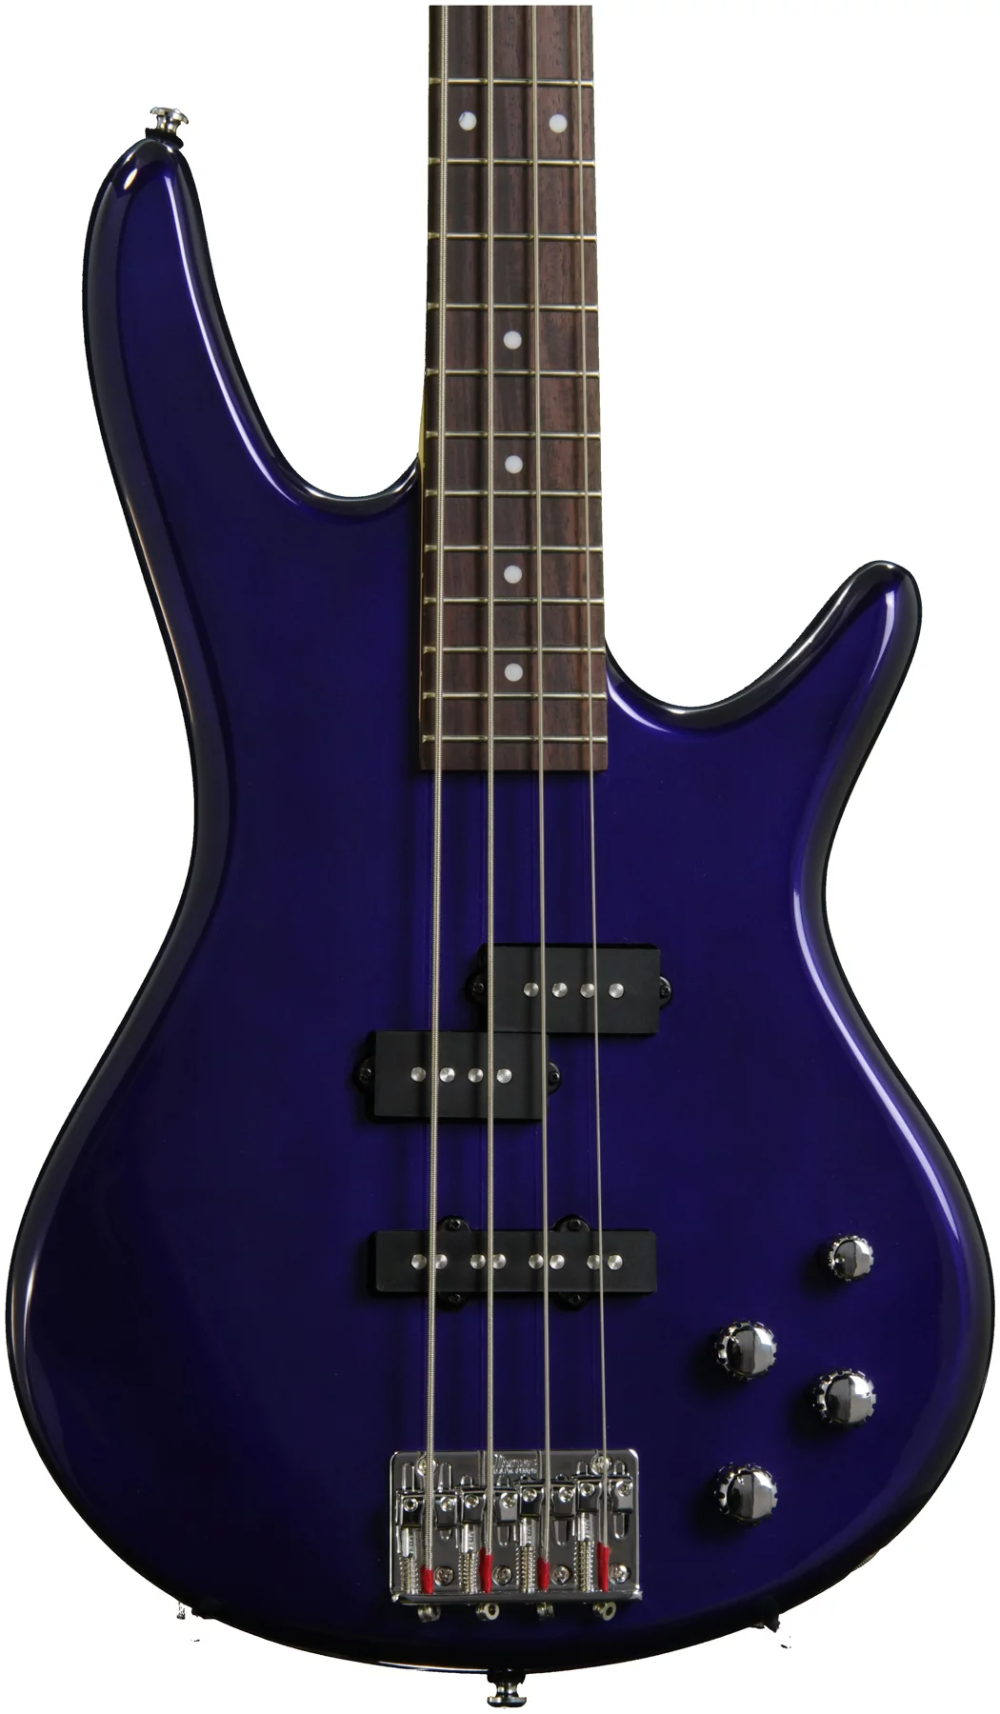 Ibanez Gio Gsr200jb Bass Guitar Jewel Blue Bass Guitar Guitar Blue Electric Guitar